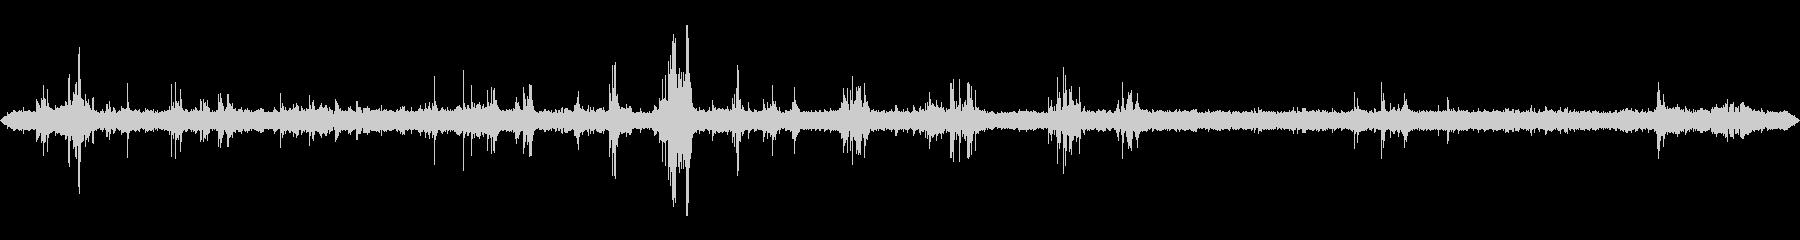 [ASMR] 風鈴とカエル_04の未再生の波形